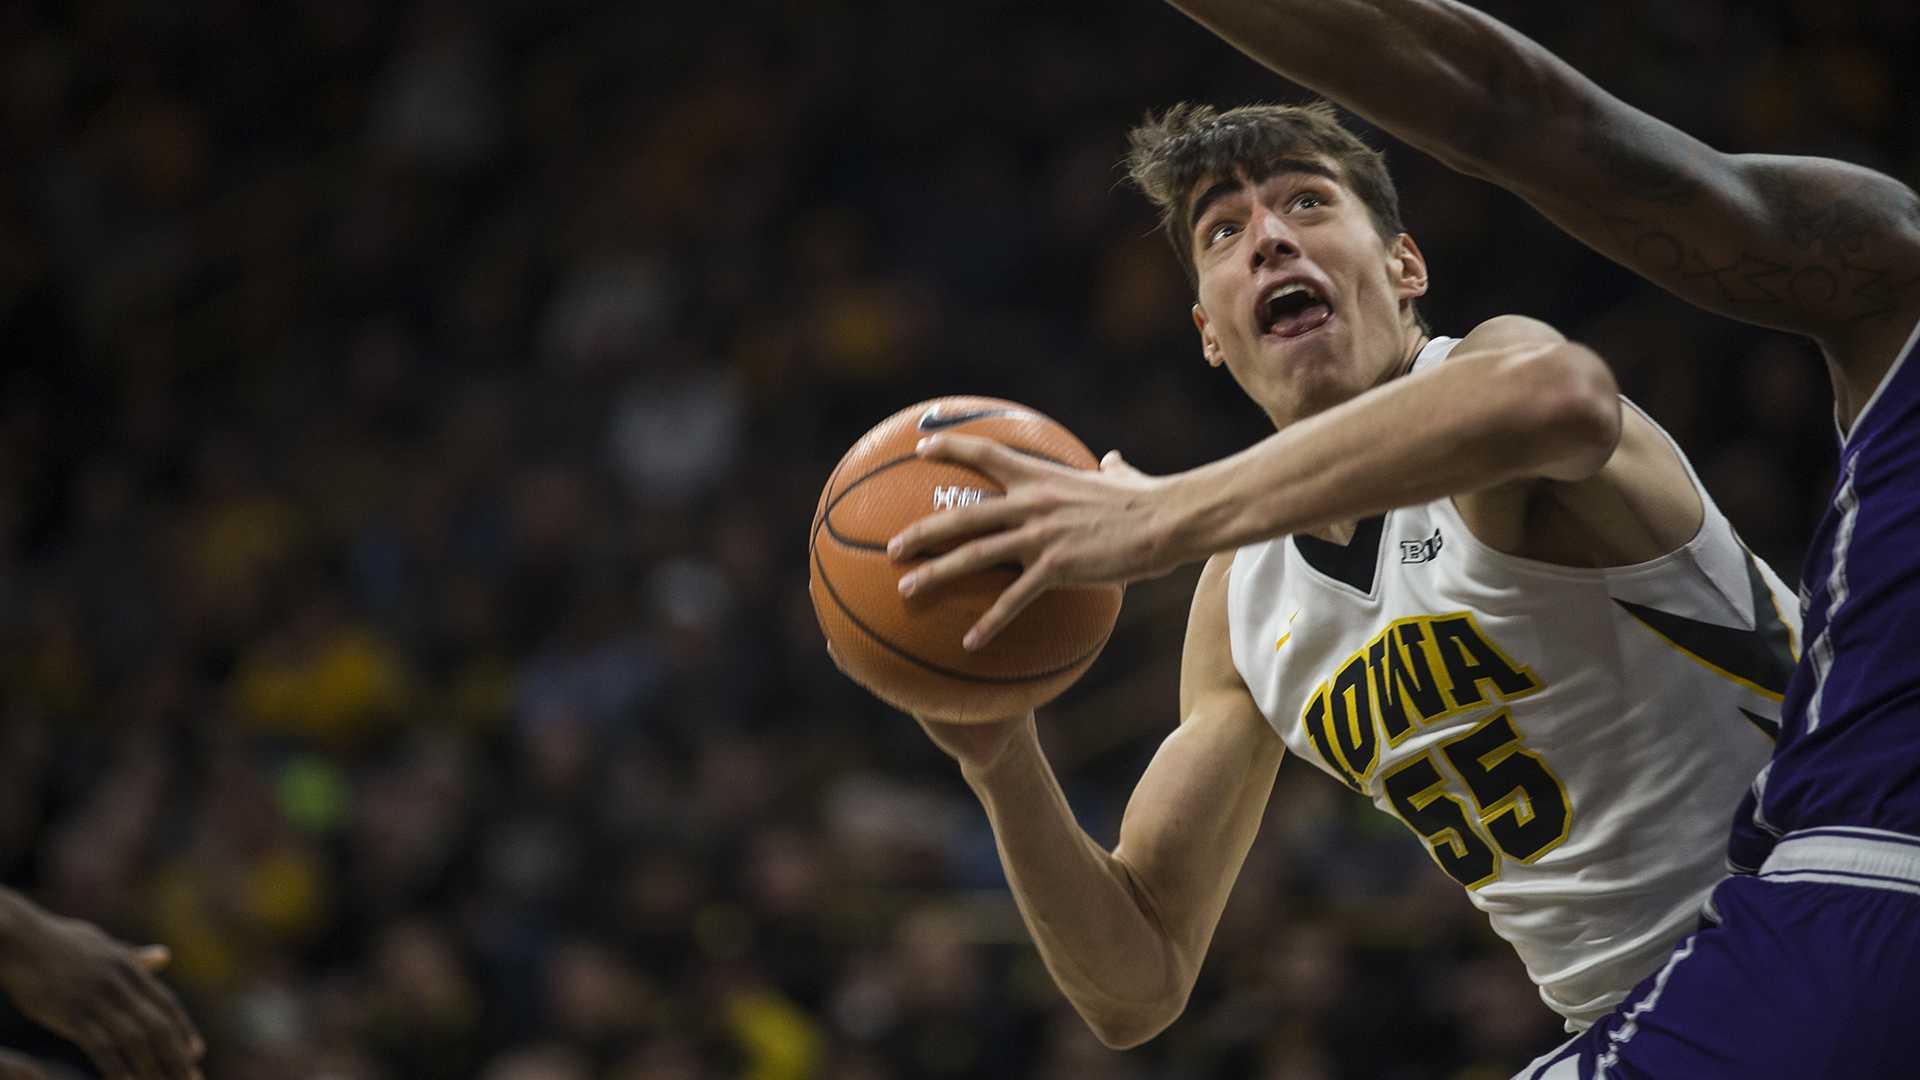 Photos: Iowa men's basketball vs. Northwestern (Senior Day)